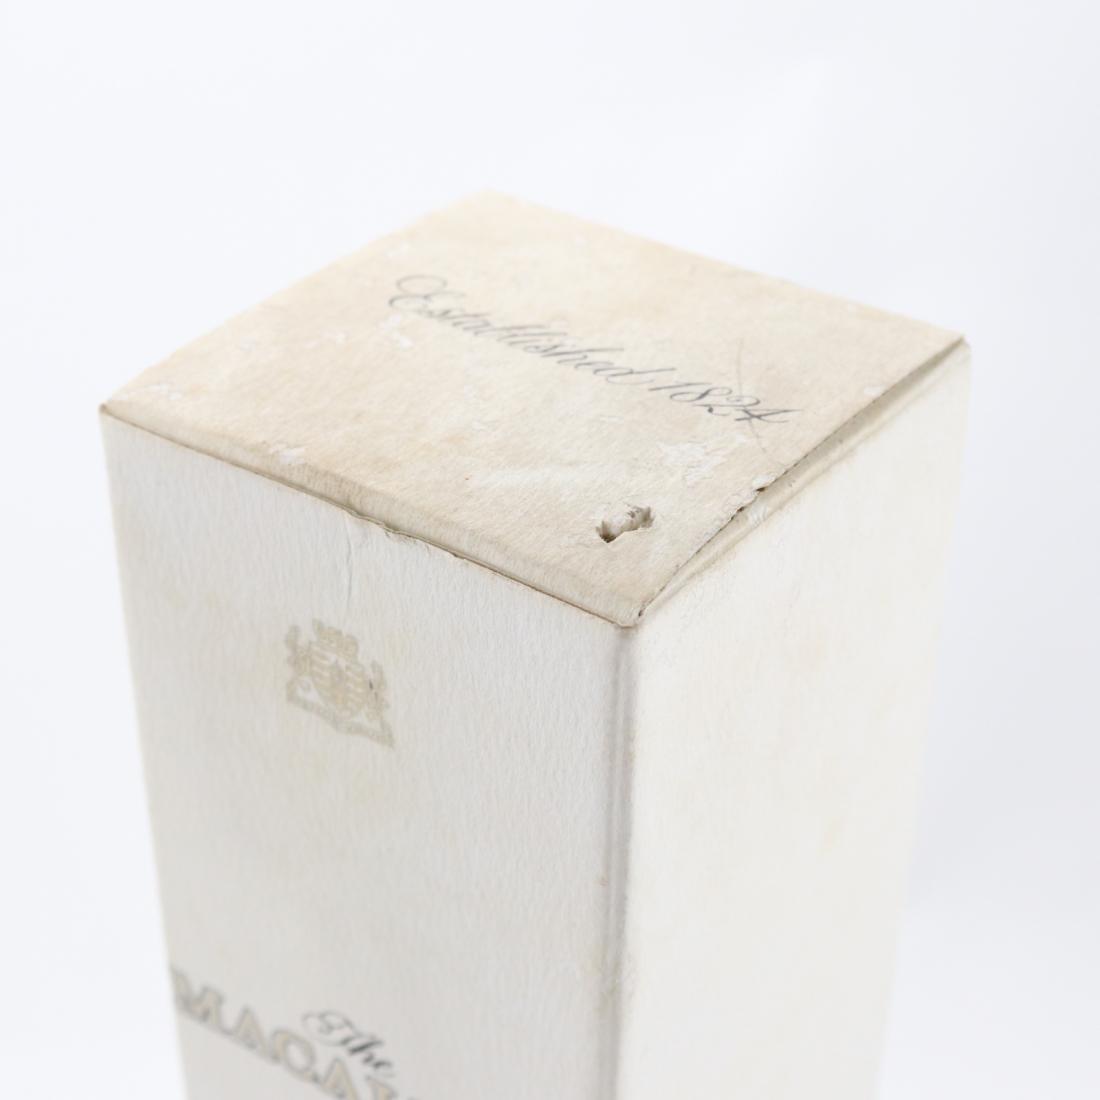 Macallan 1968 18 Year Old / Giovinetti Import